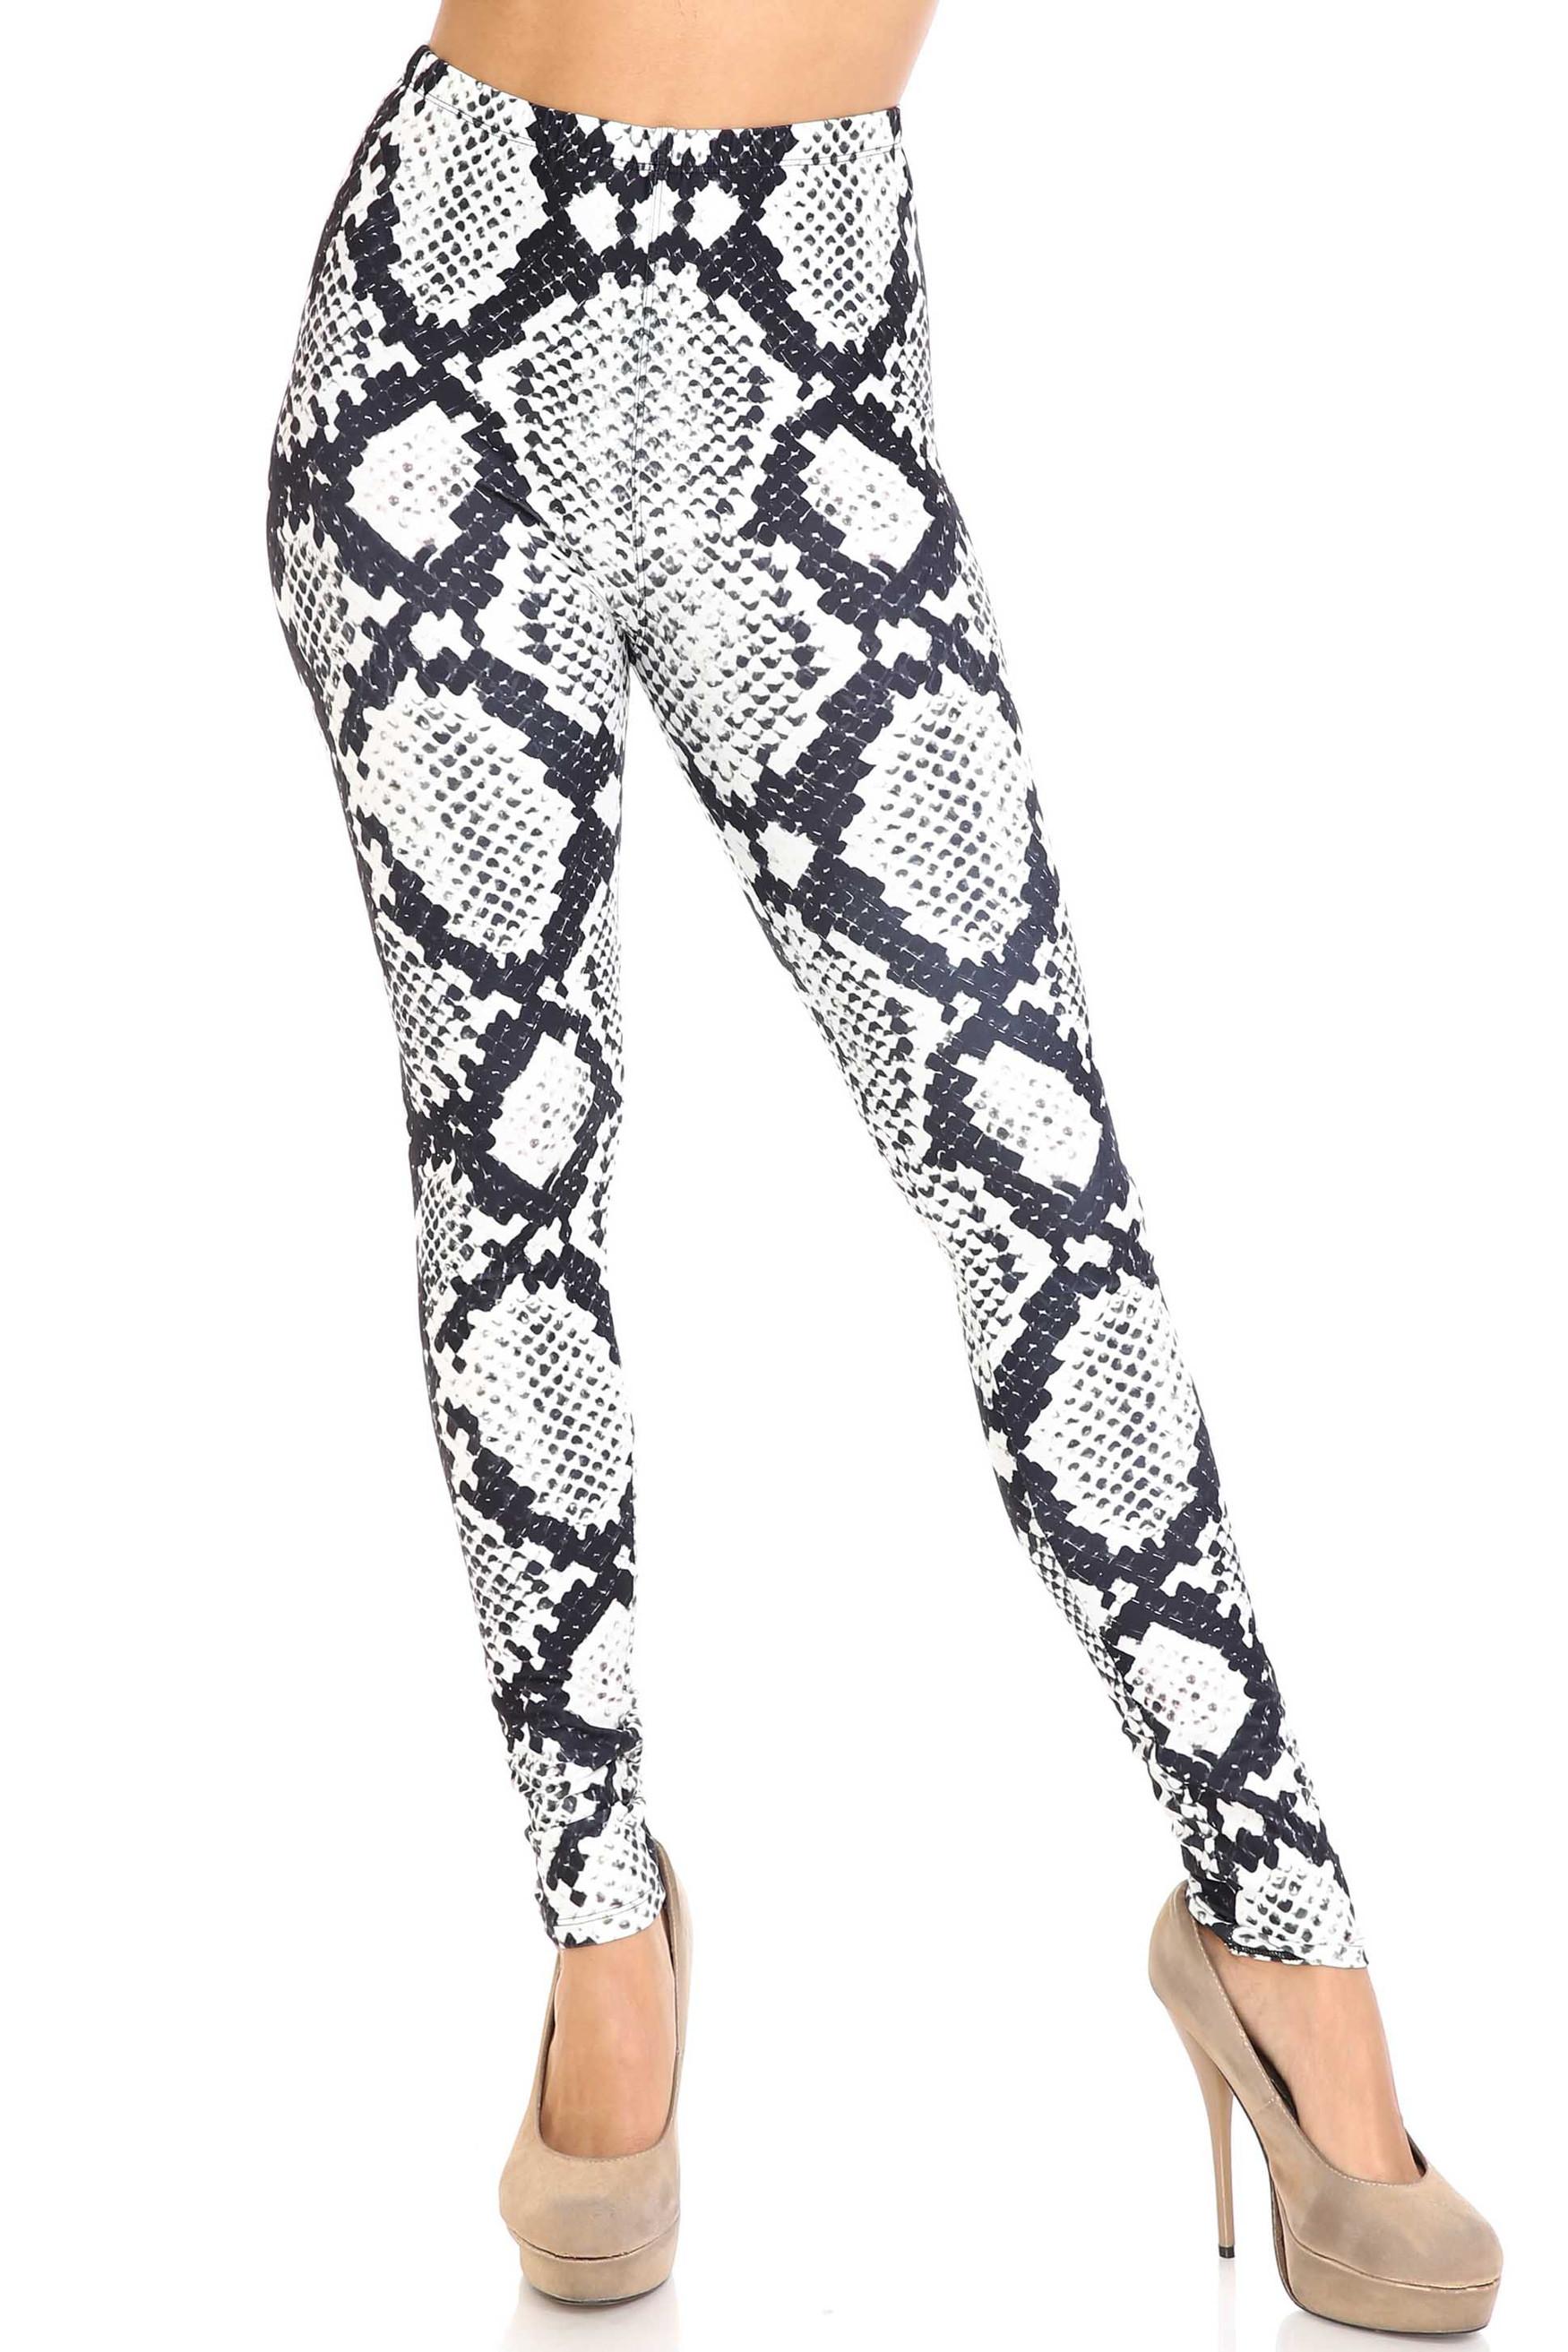 Creamy Soft Black and White Python Snakeskin Plus Size Leggings - By USA Fashion™